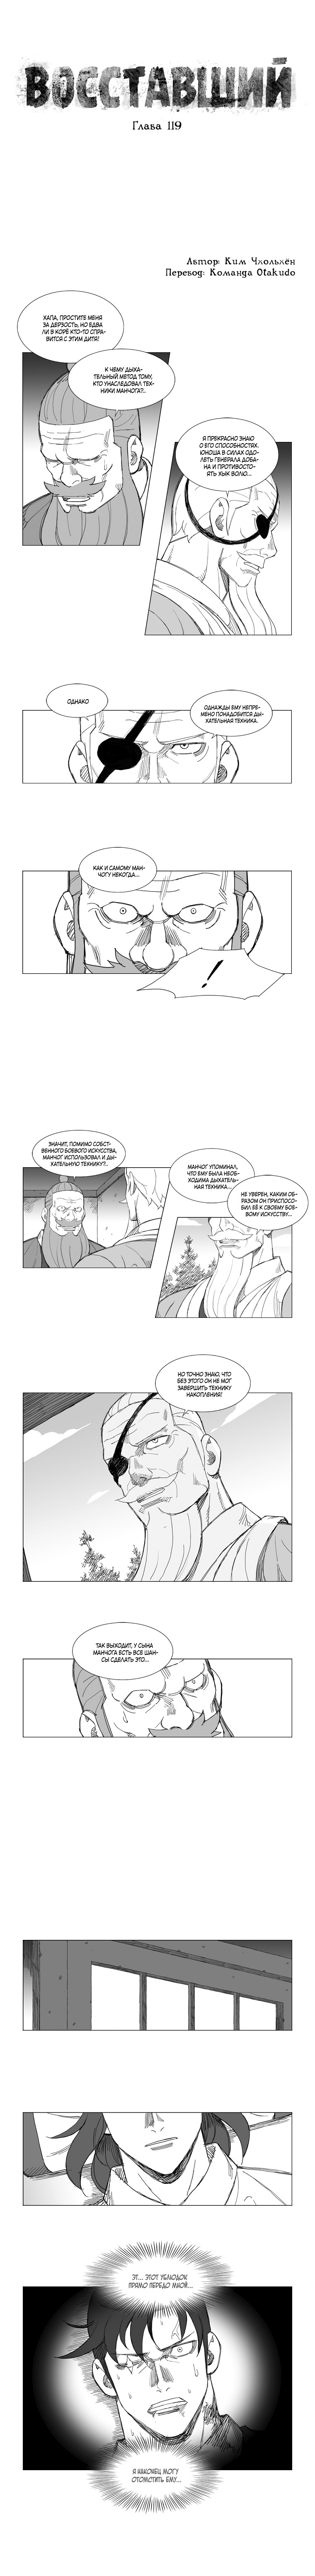 https://r1.ninemanga.com/comics/pic2/39/28263/416244/1532707533116.jpg Page 1